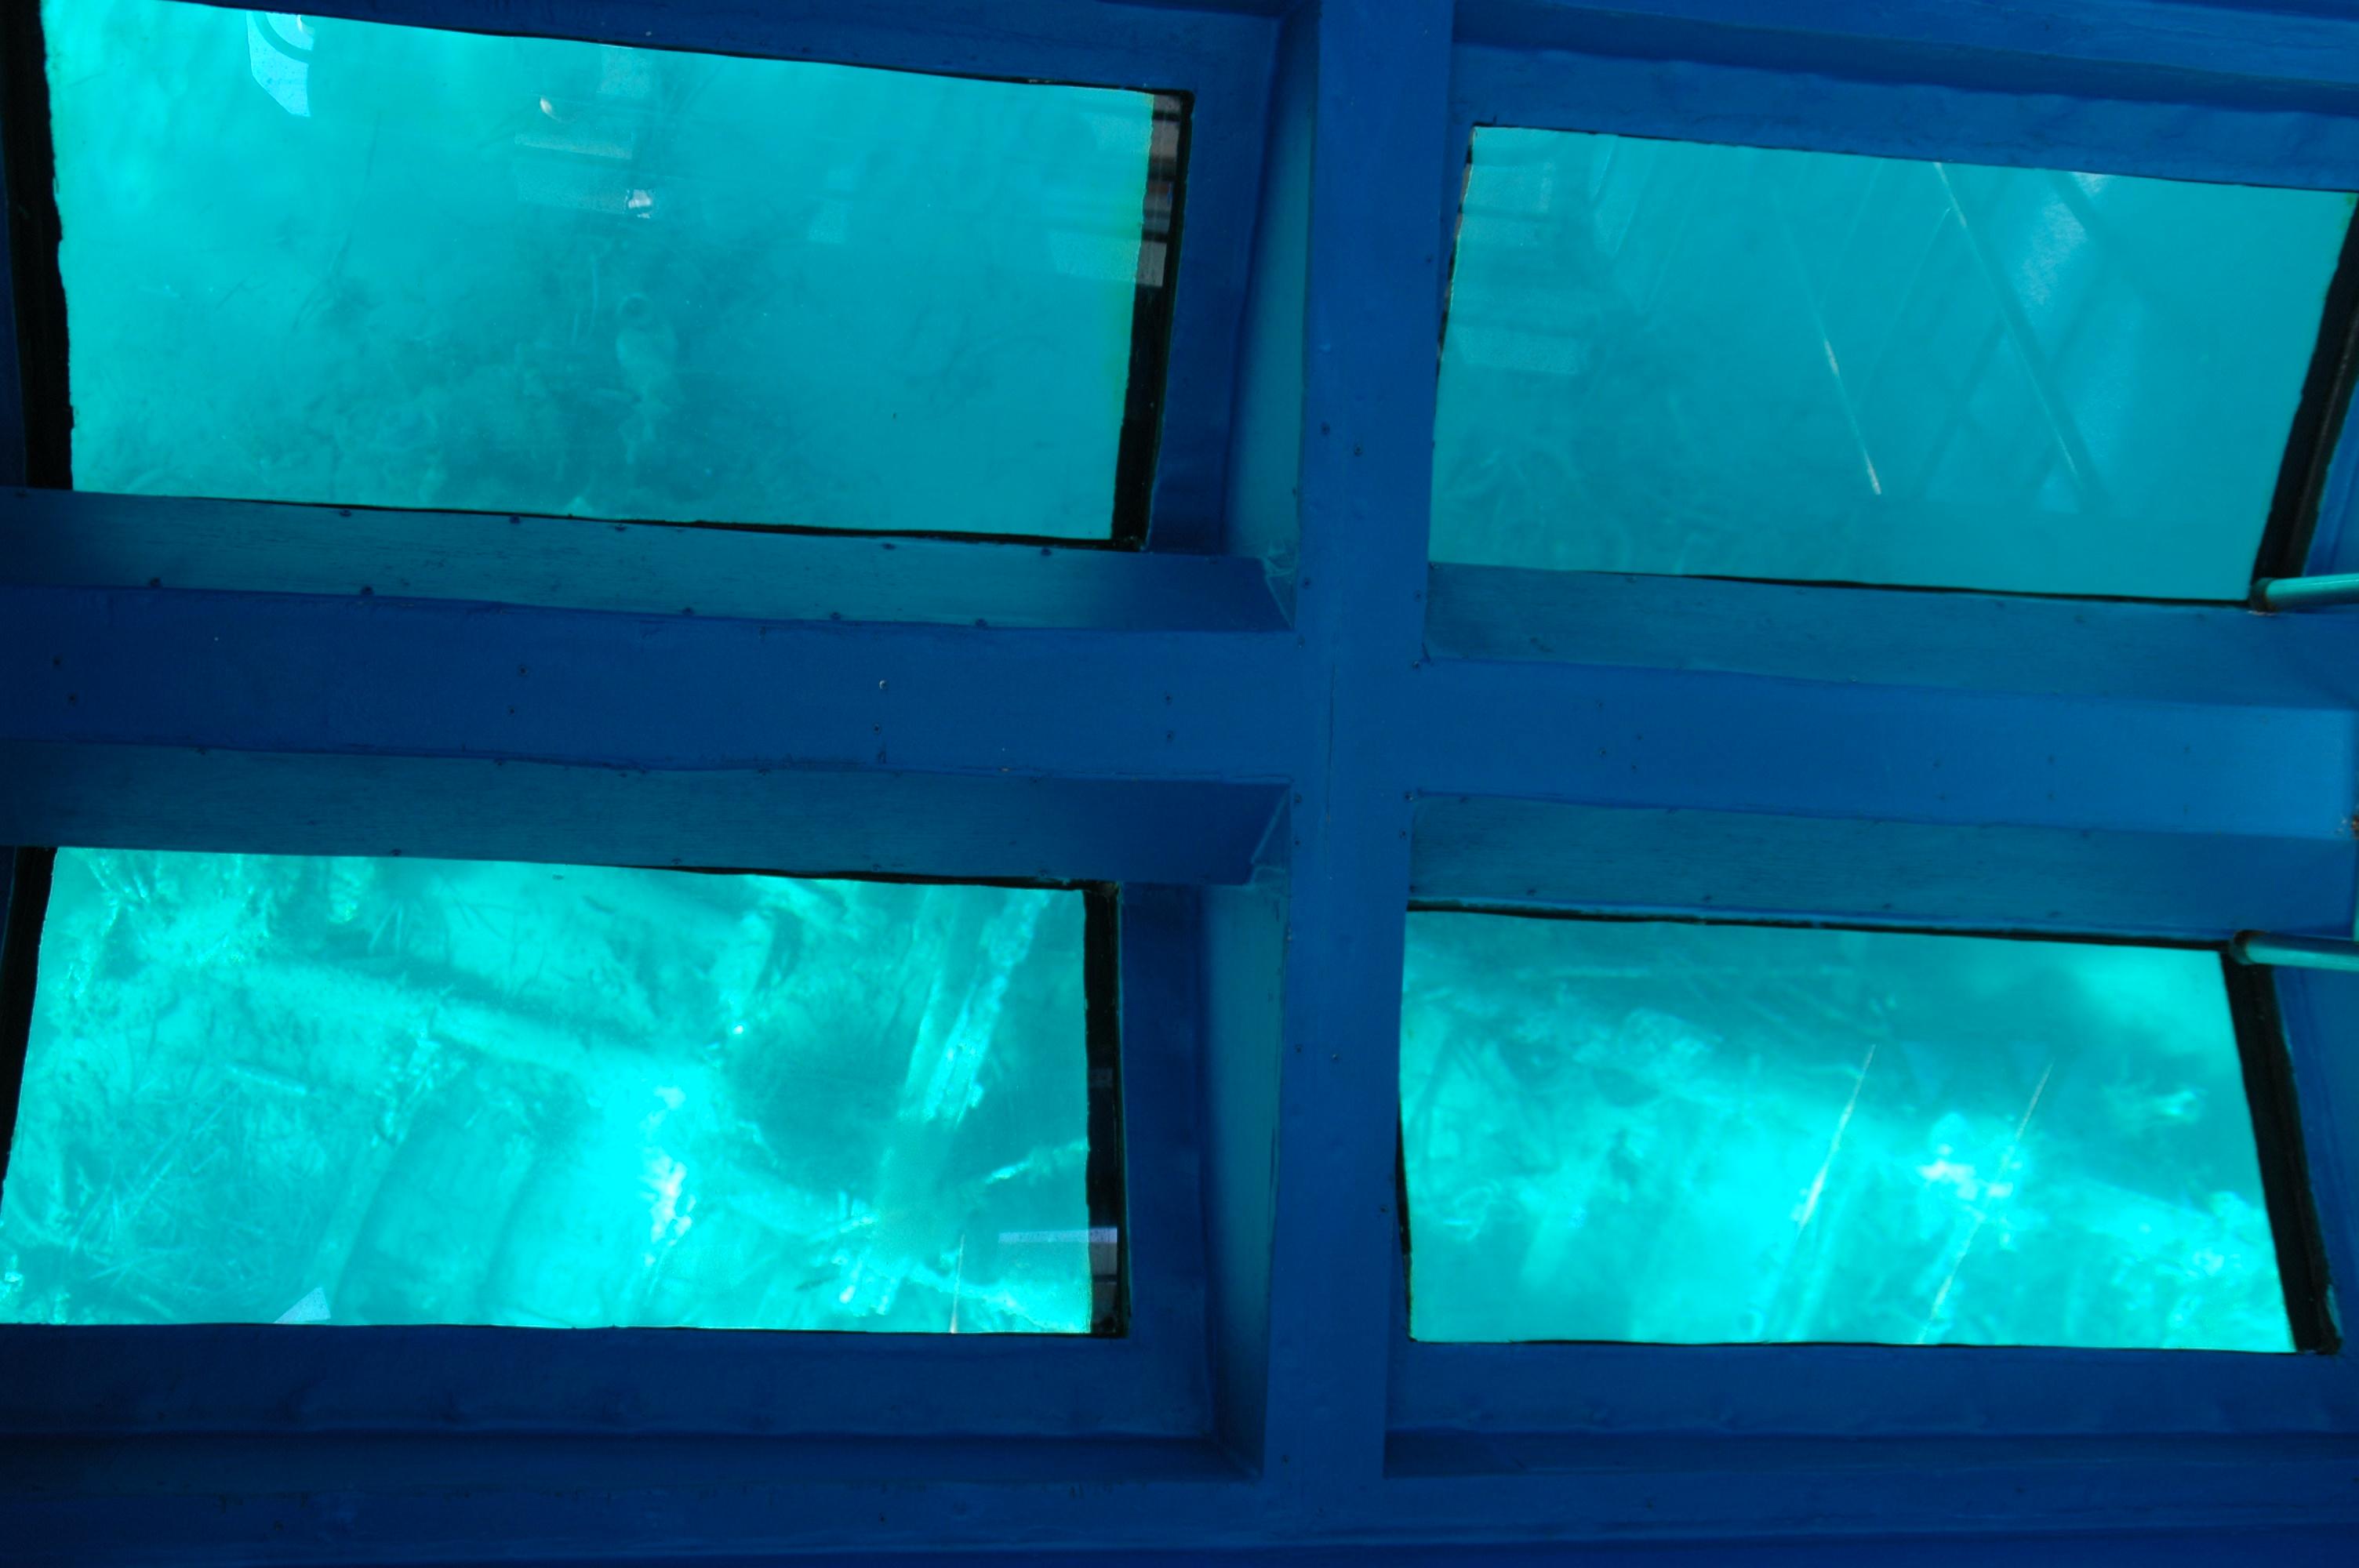 Windows showing view of underwater